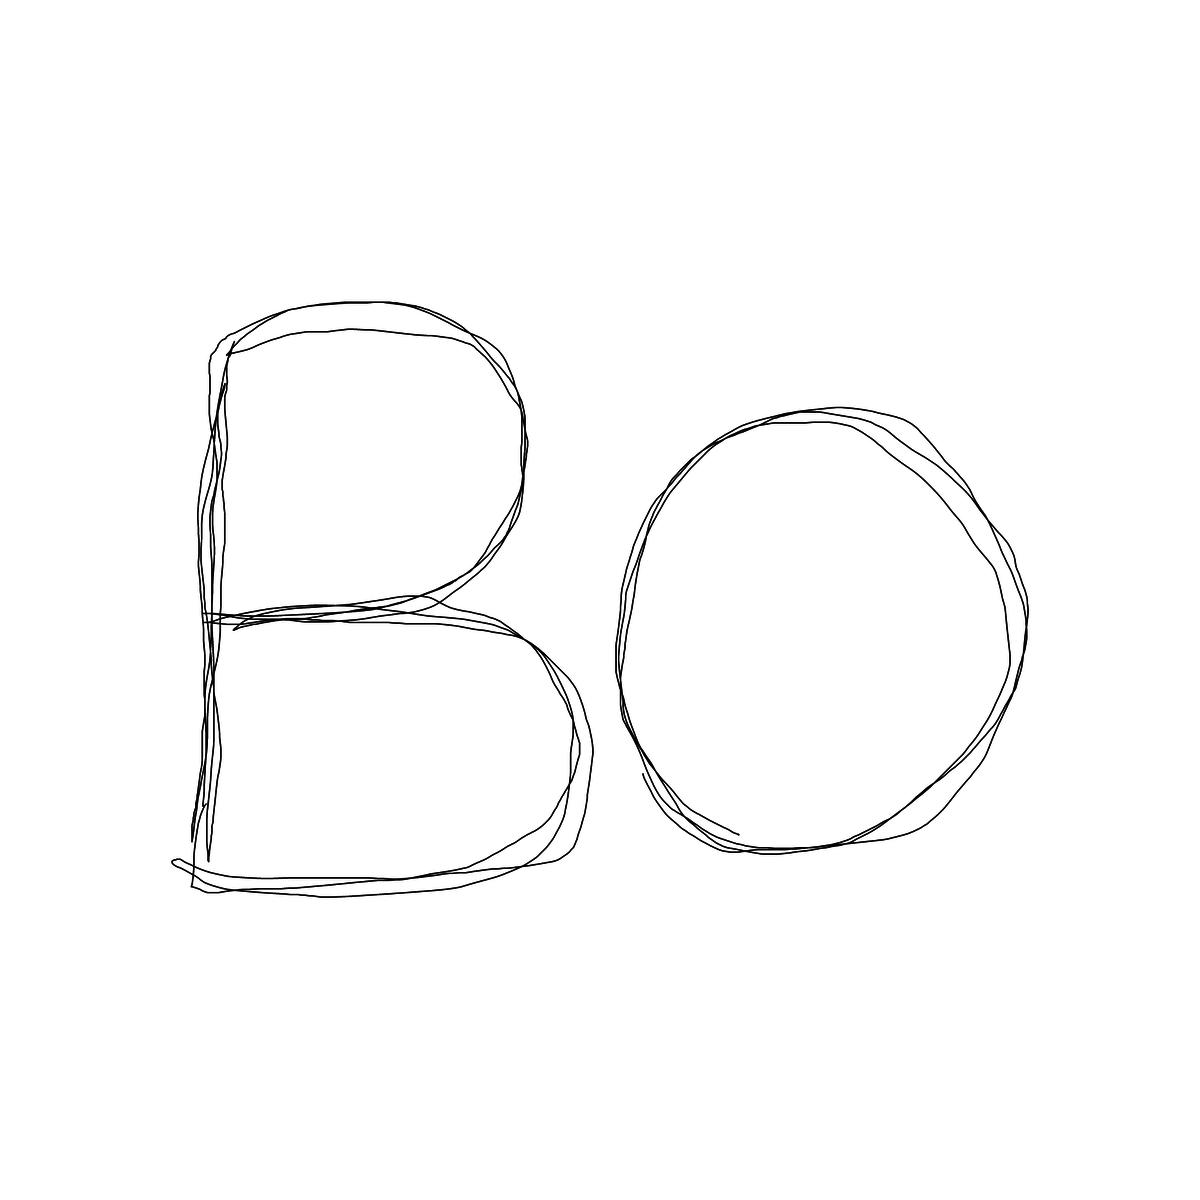 BAAAM drawing#18868 lat:-23.5504760742187500lng: -46.6329460144043000